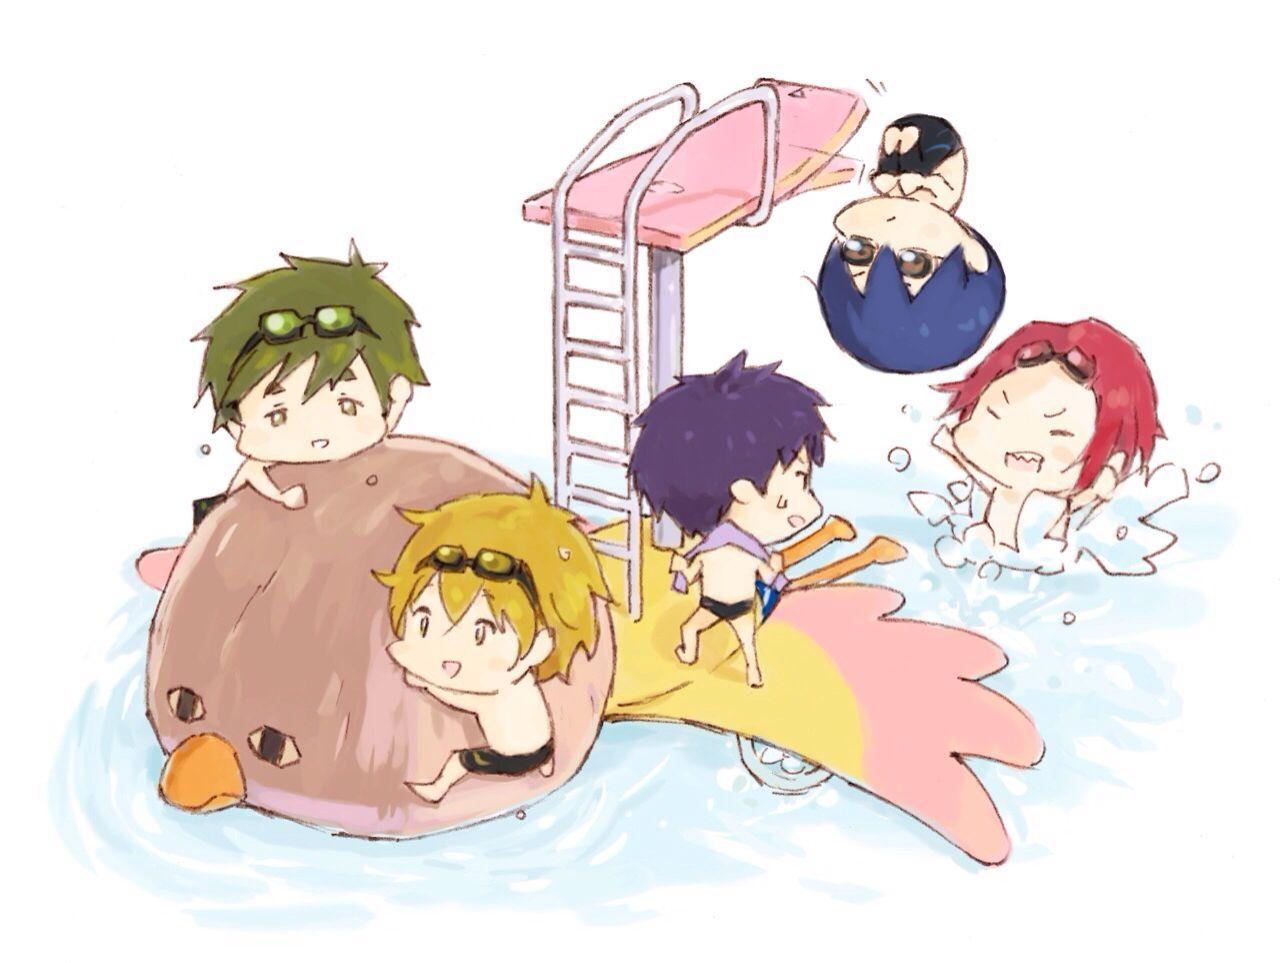 Free Minna San Free Iwatobi Swim Club Free Anime Iwatobi Swim Club